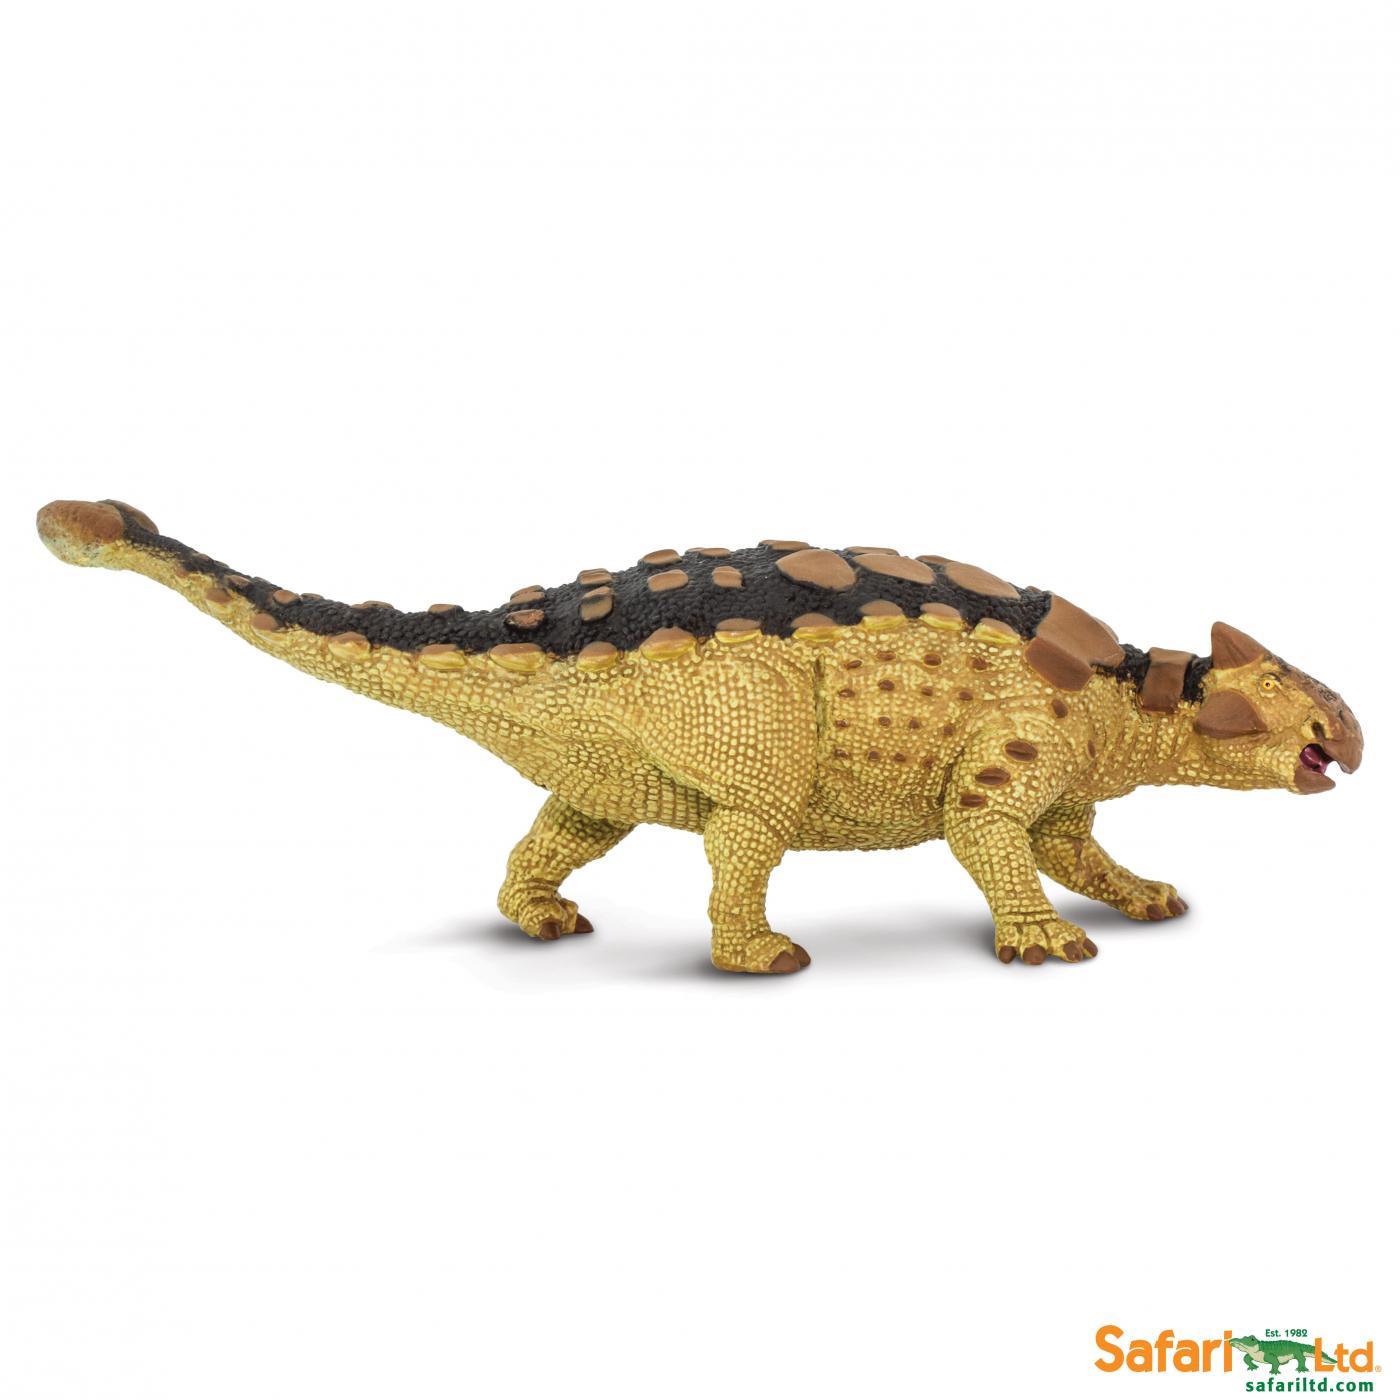 Wild Safari Prehistoric World Quetzalcoatlus Safari Ltd New Toy Figure